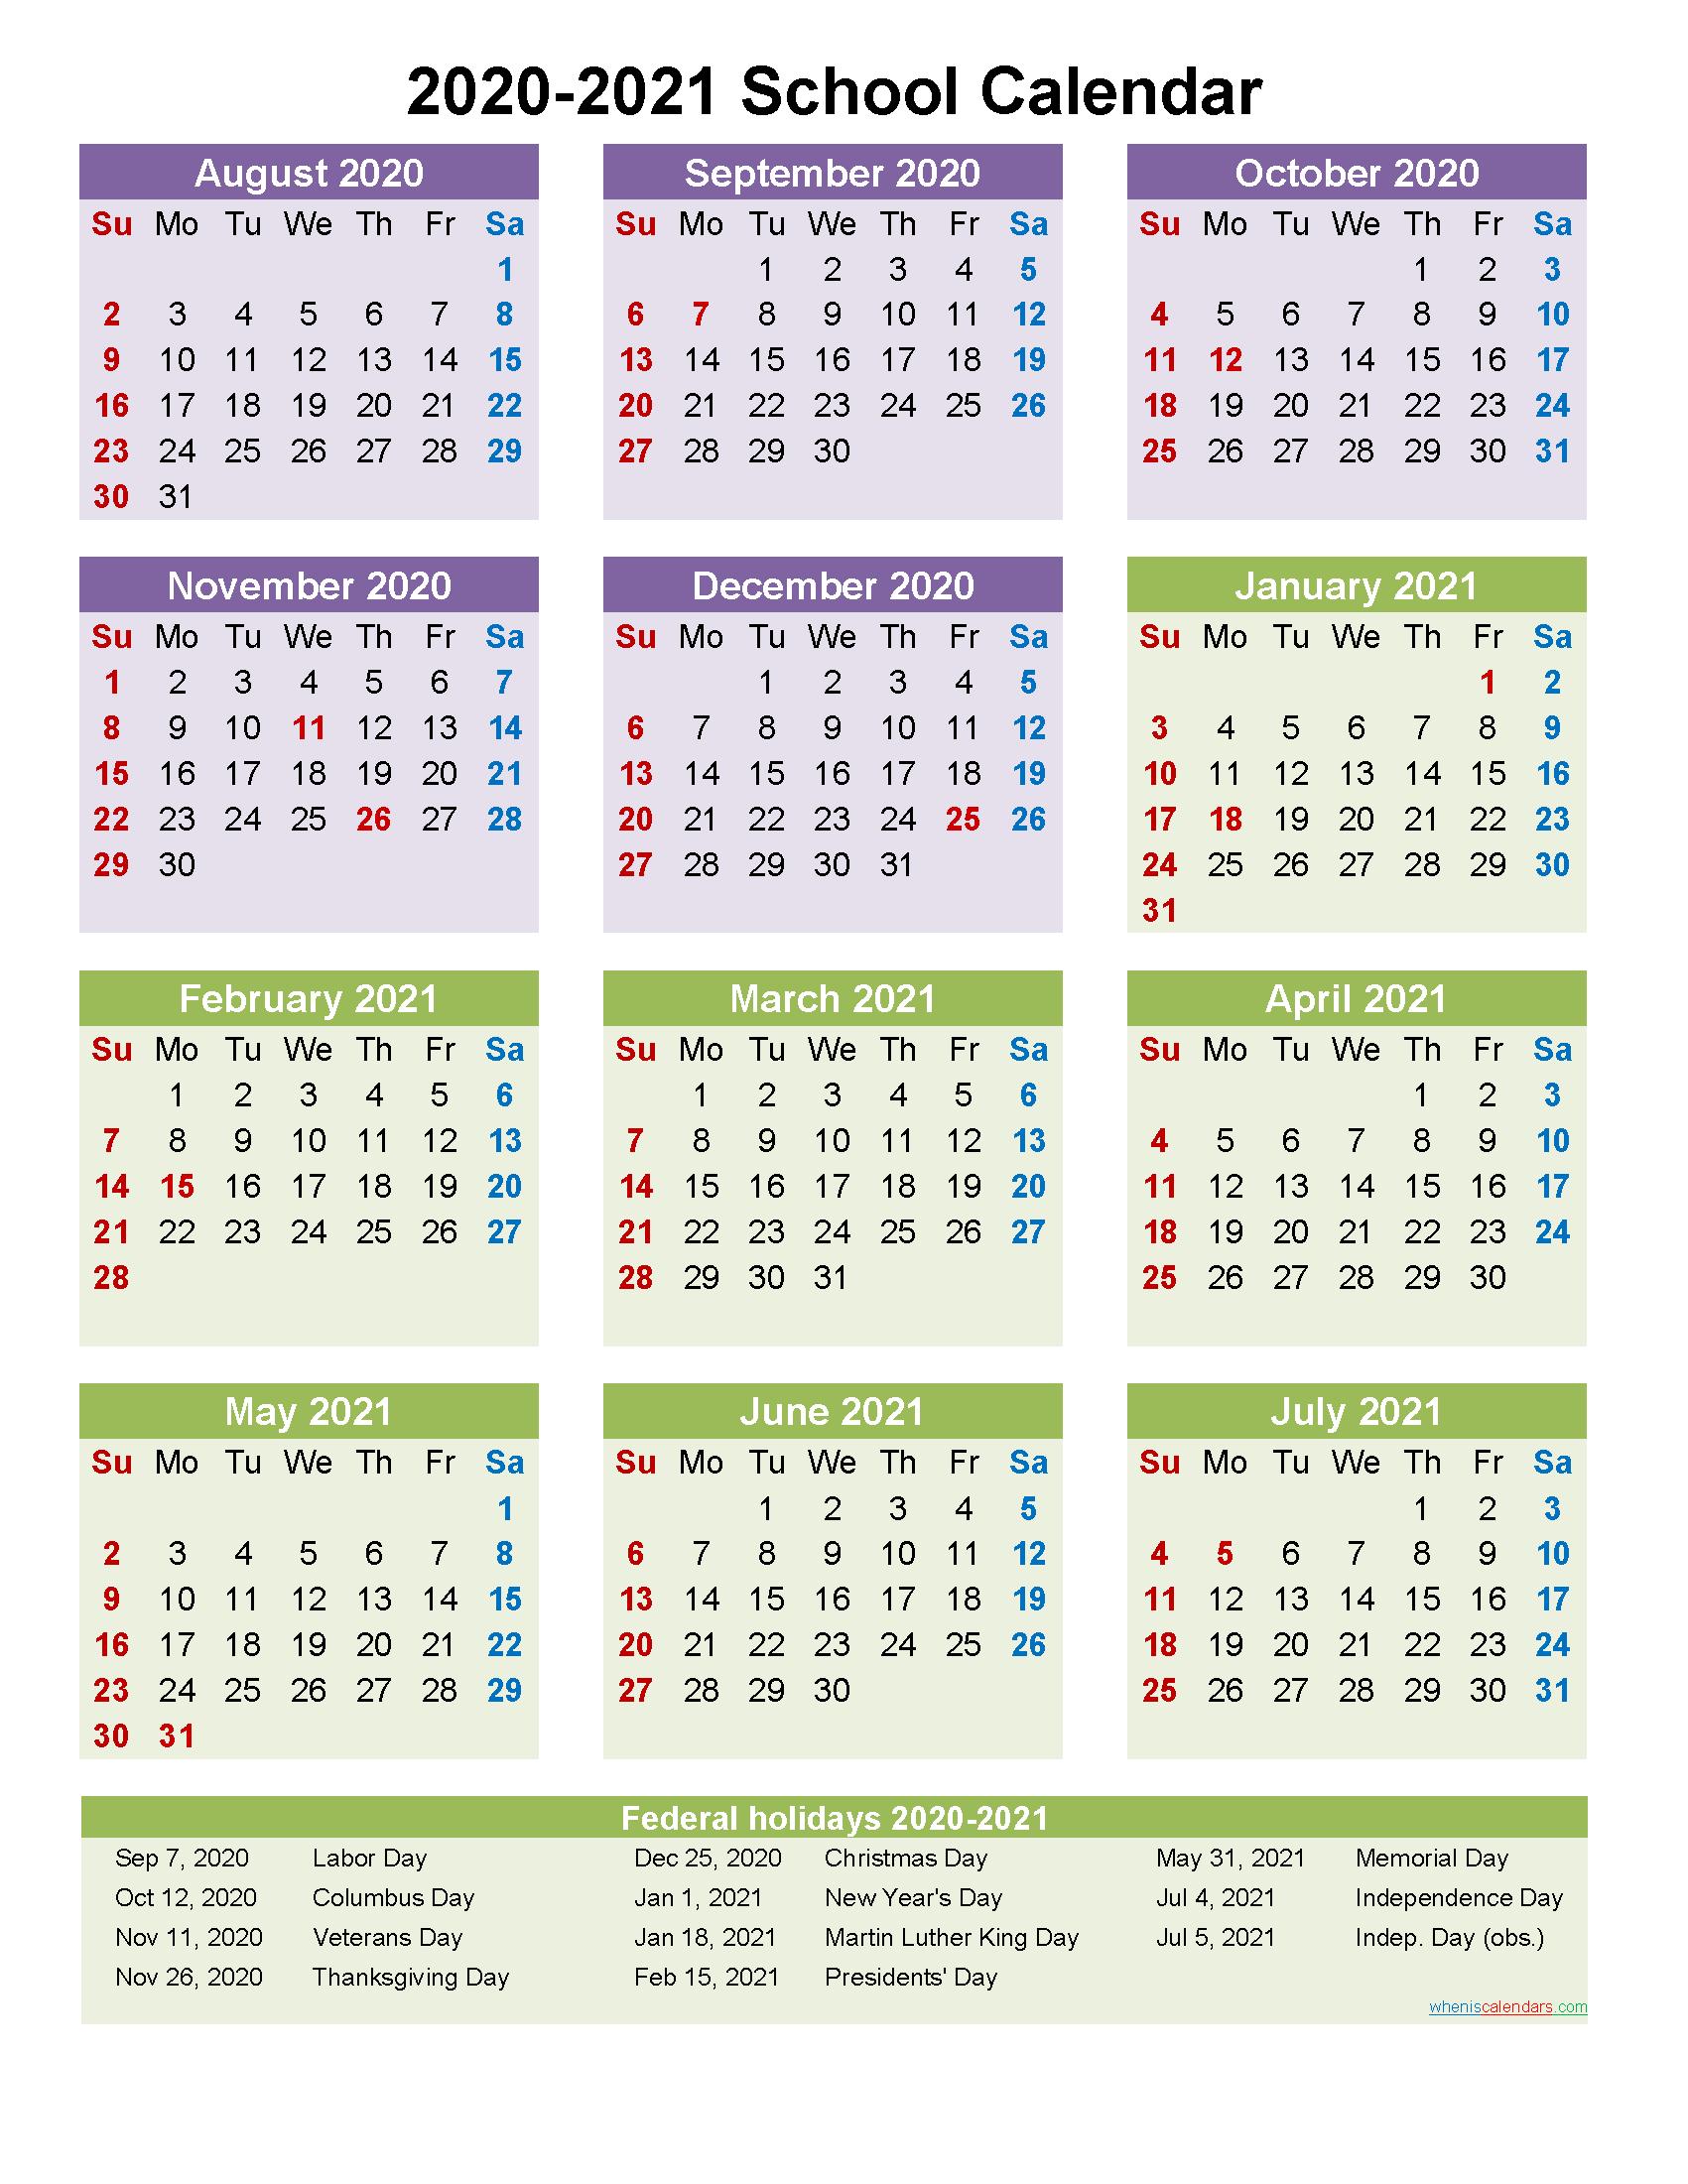 2020 And 2021 School Calendar Printable (Portrait